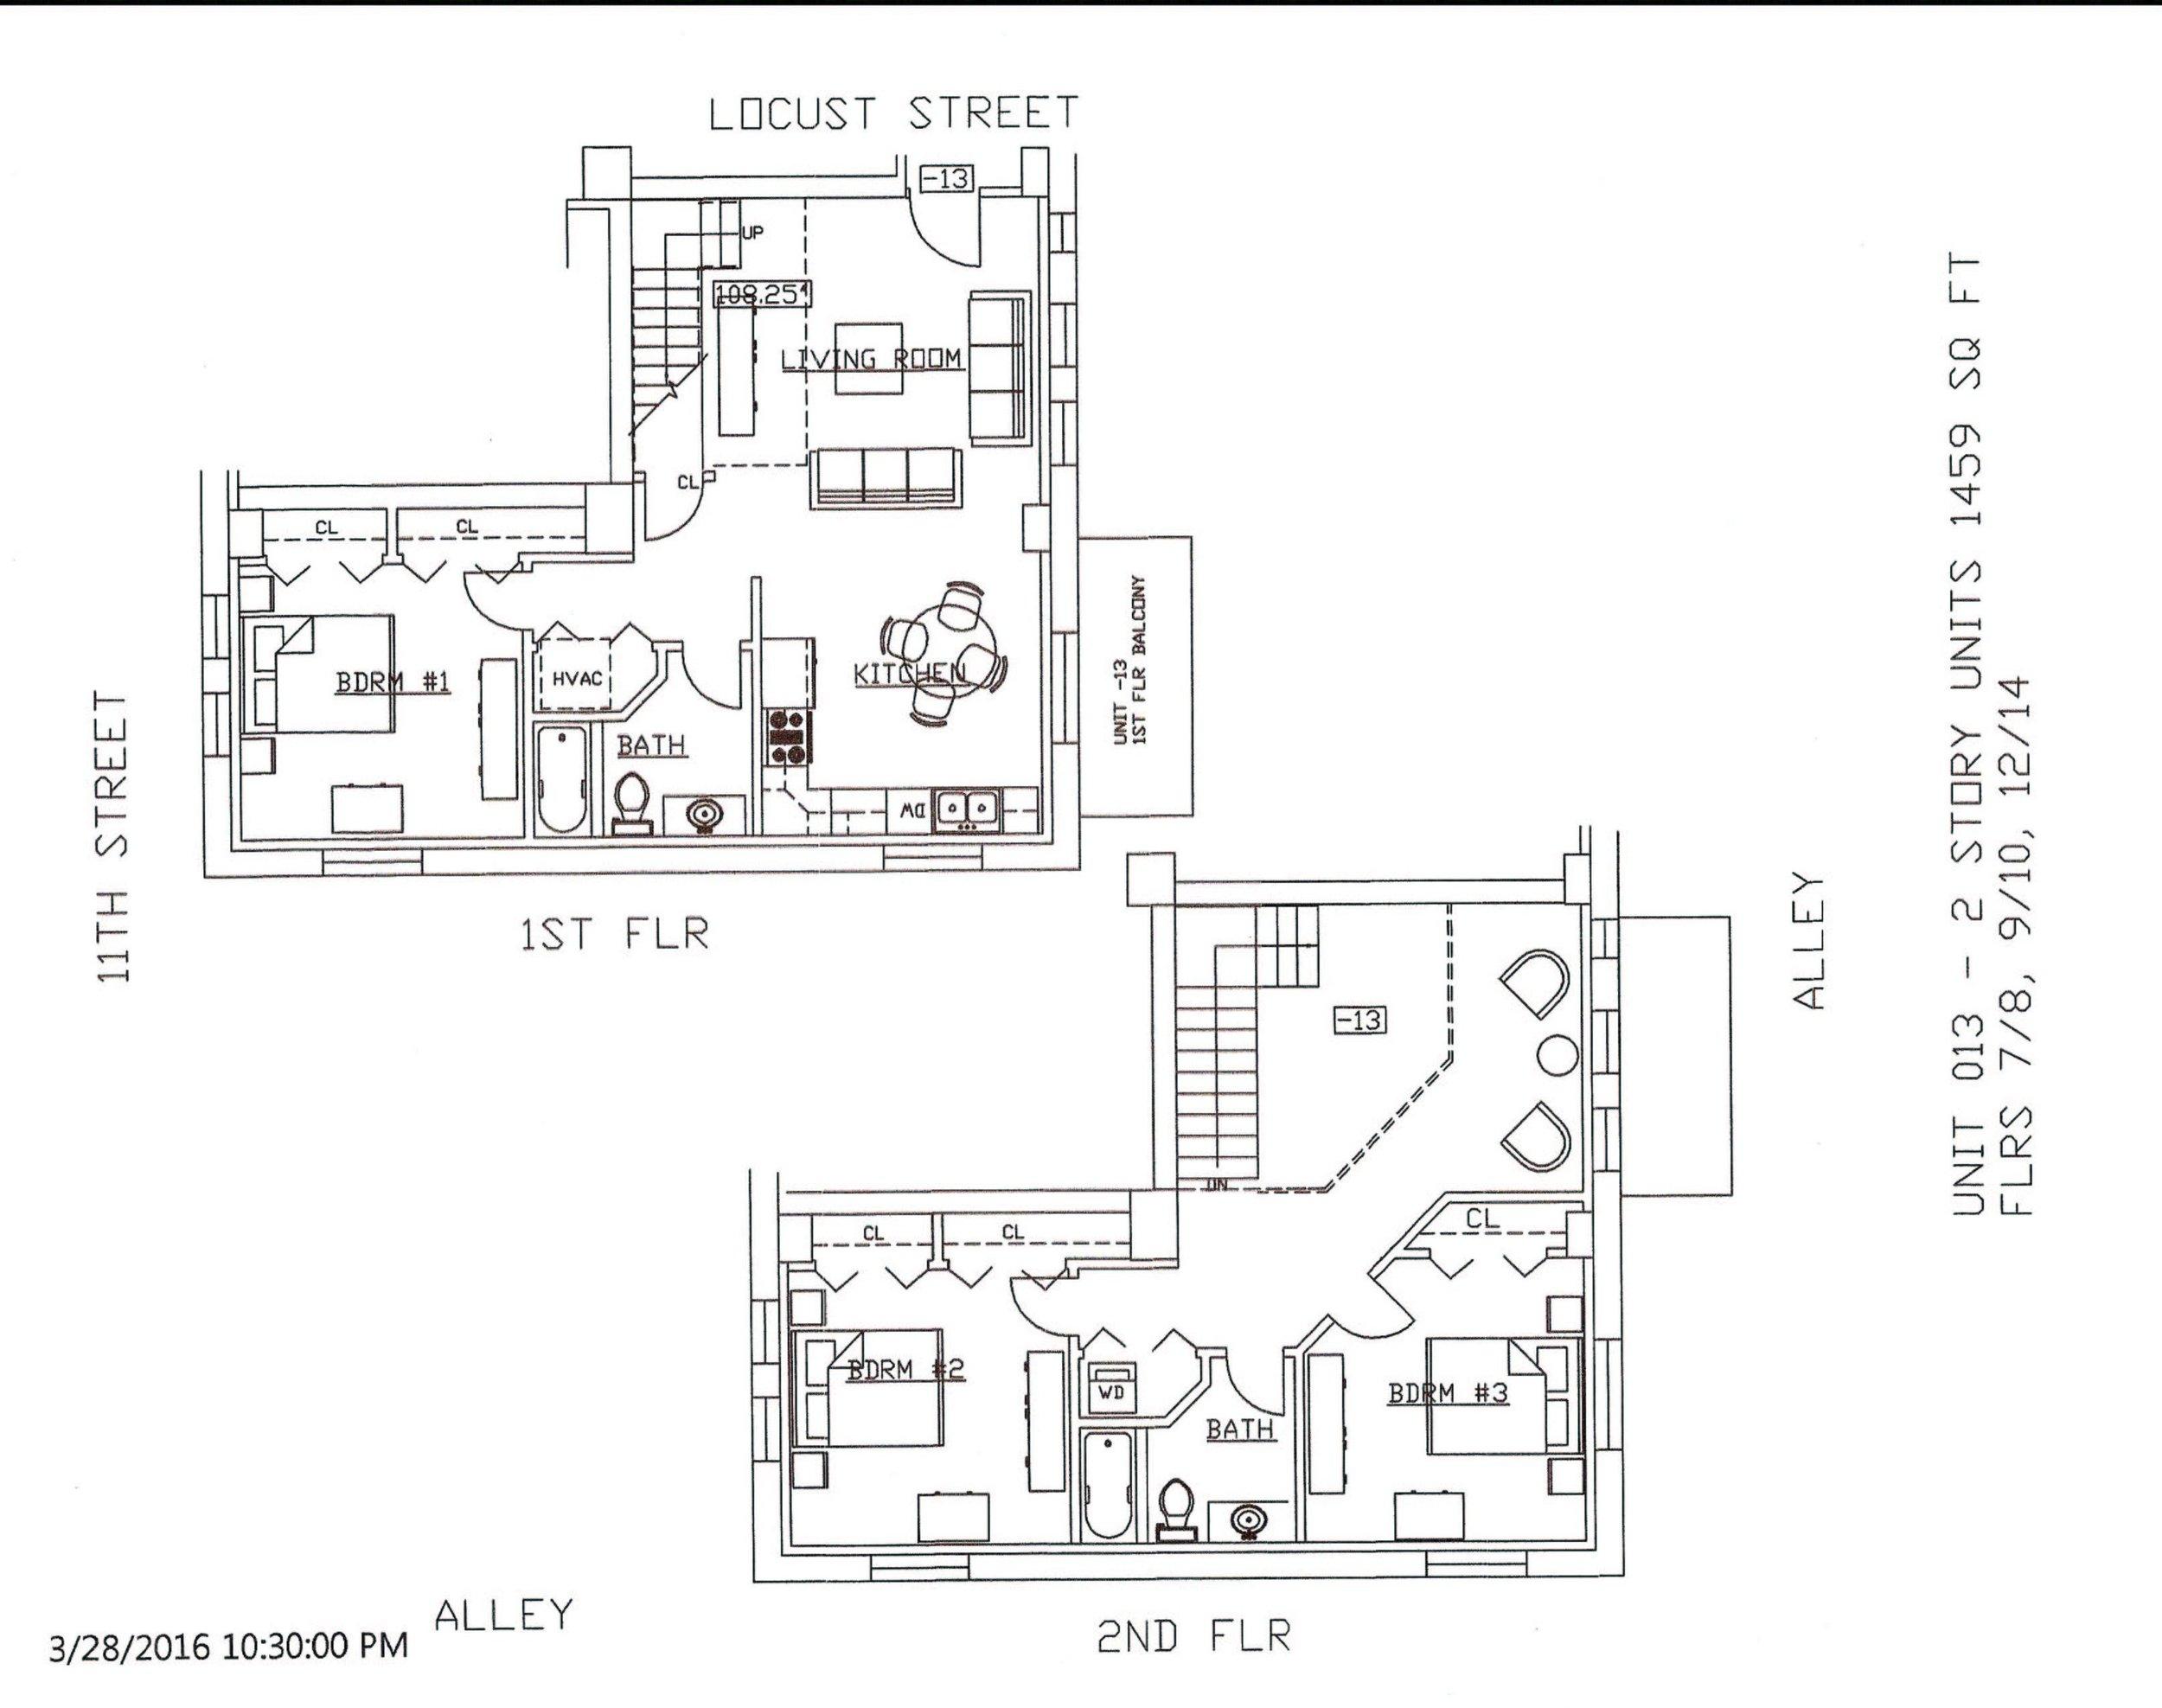 Unit 13, 1459 Square Feet